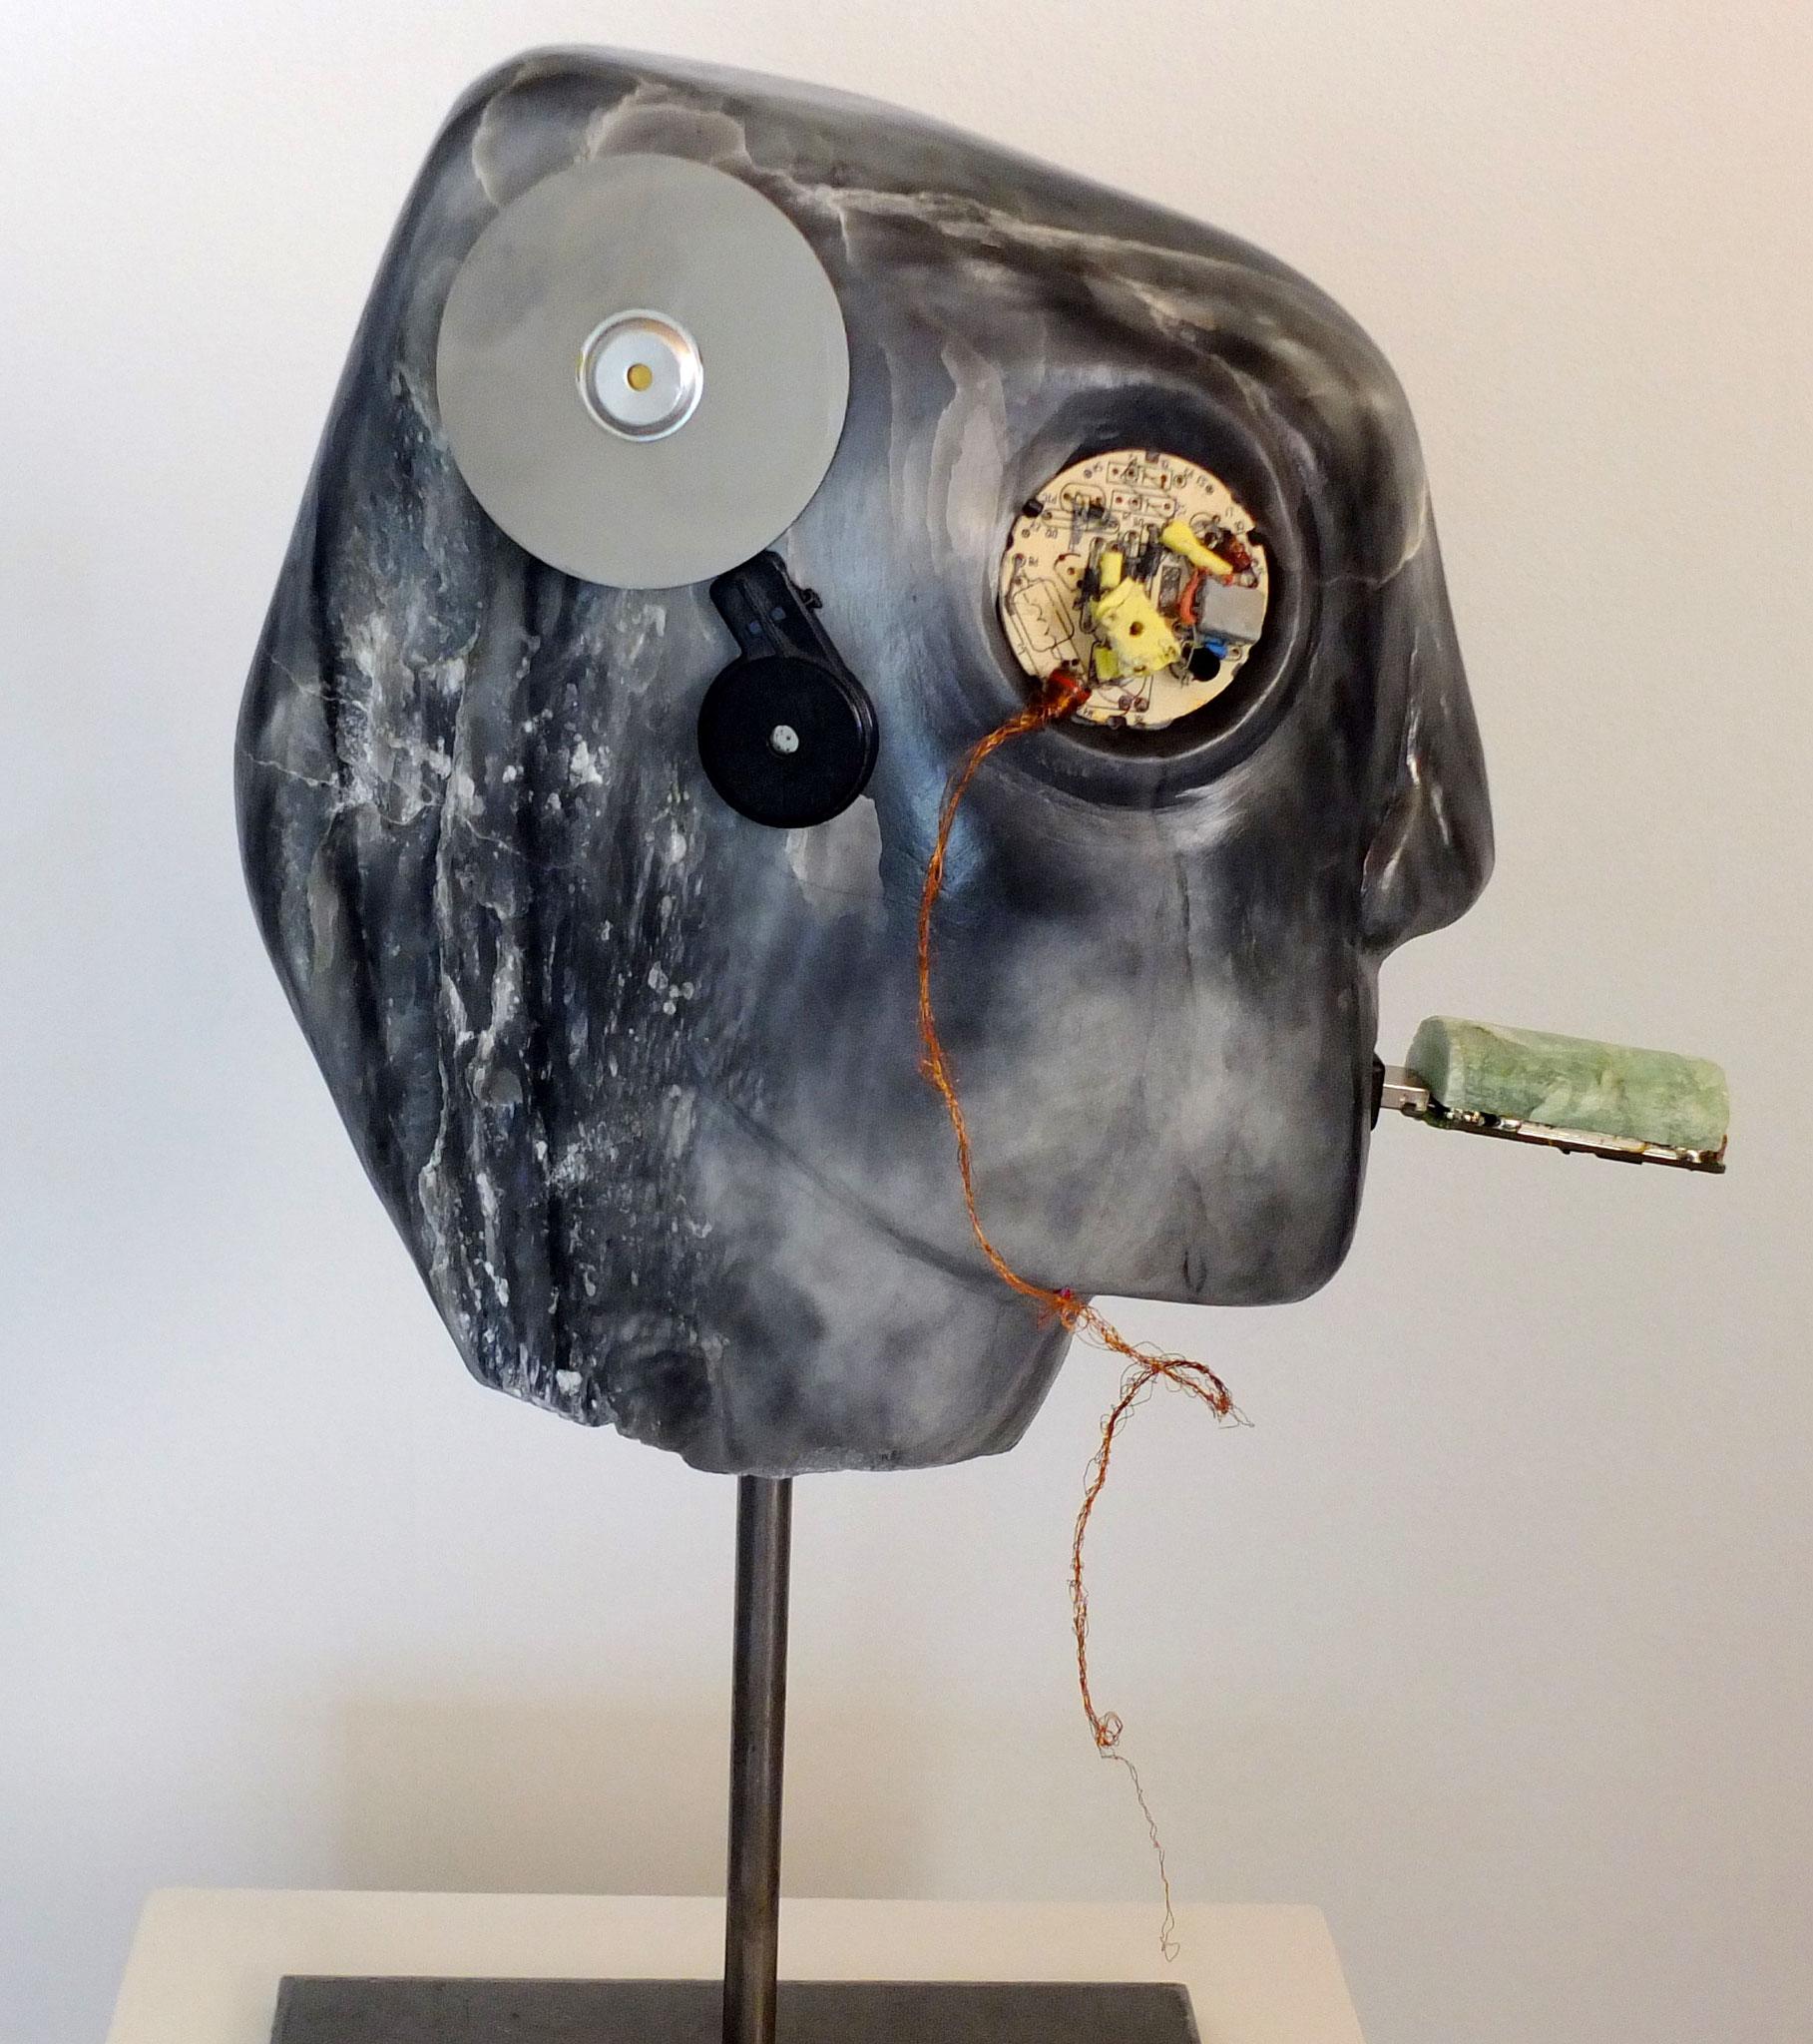 41x32x11 cm, soapstone, e-waste